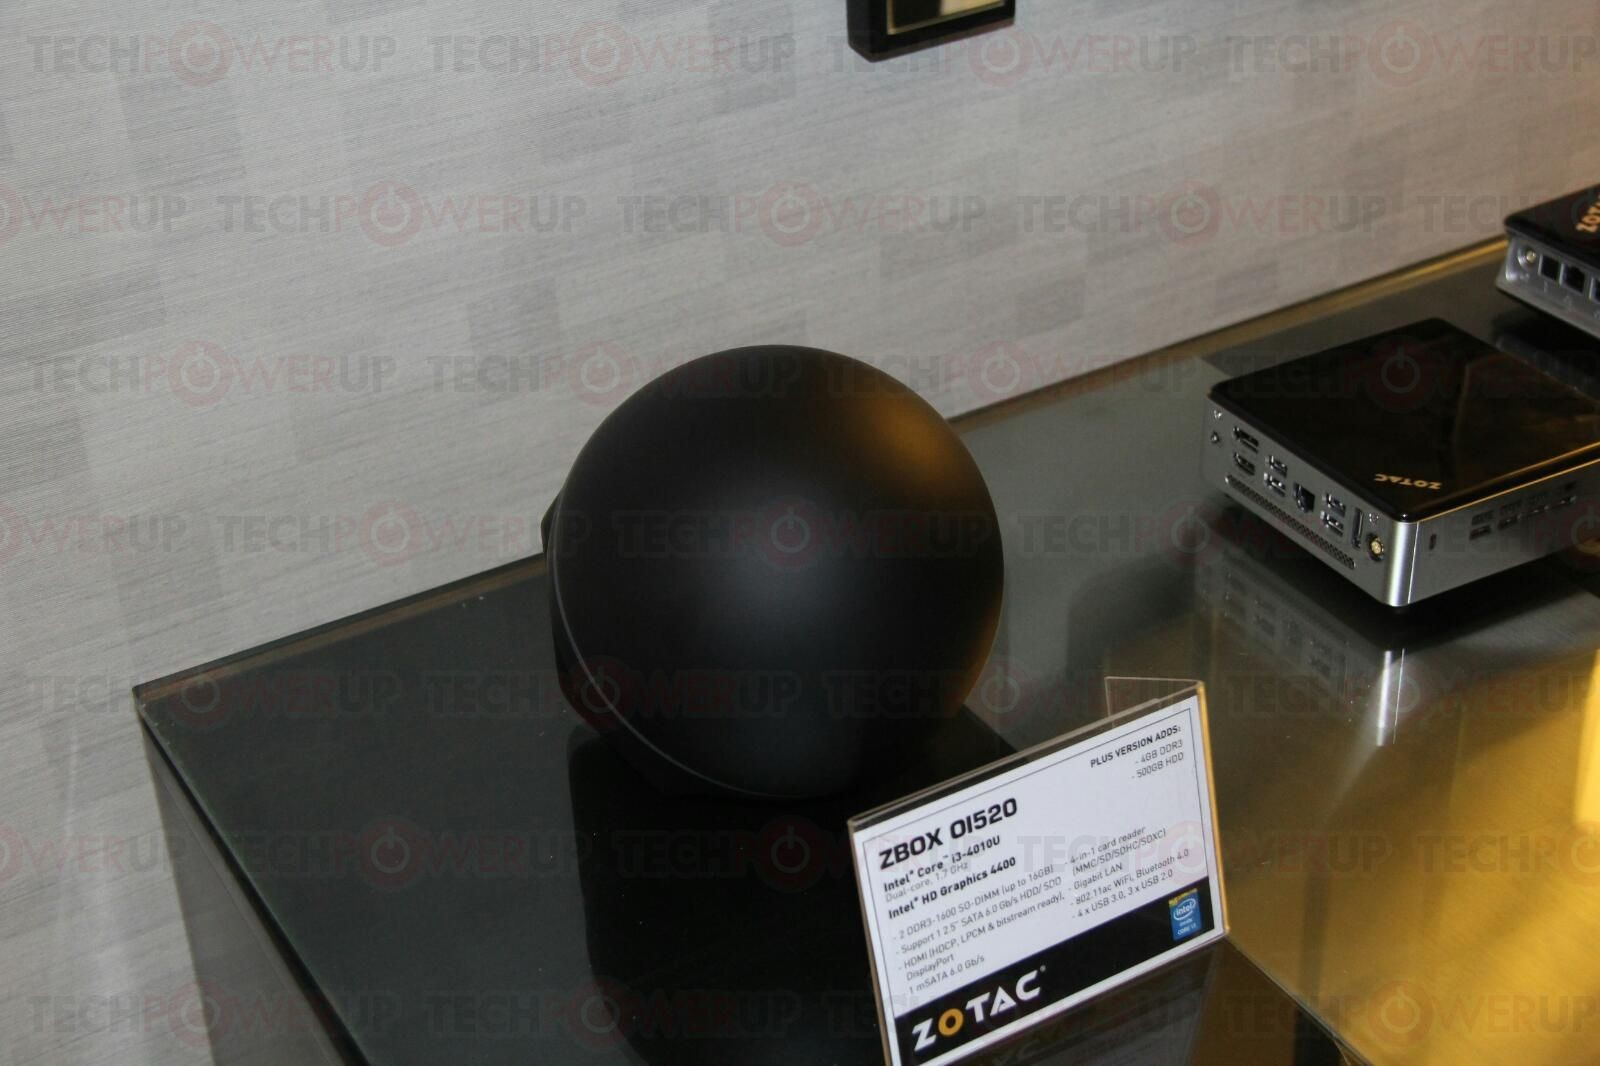 Mini PC ZBOX 01520